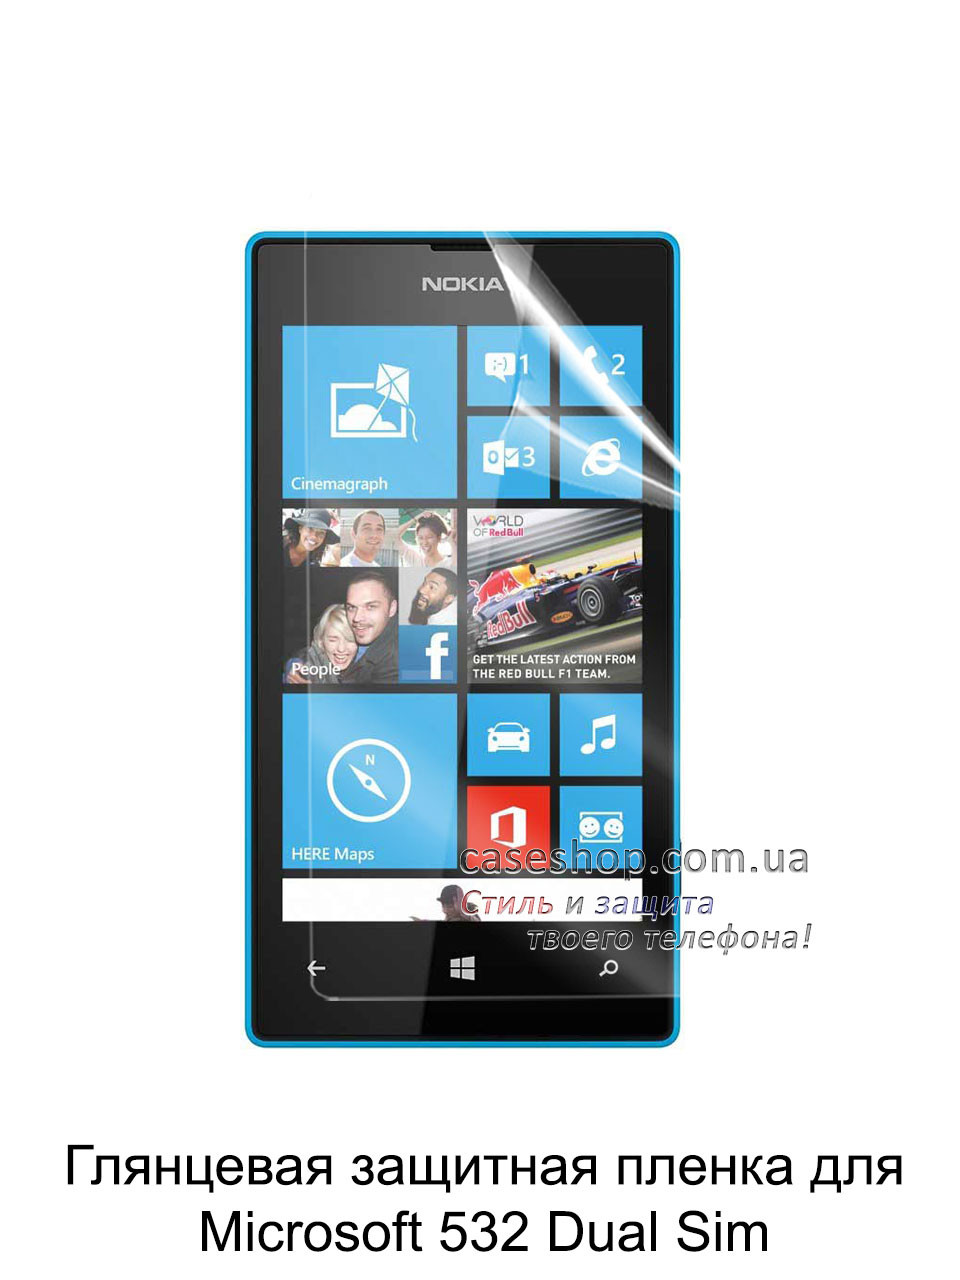 Глянцевая защитная пленка для Microsoft Lumia 532 Dual Sim